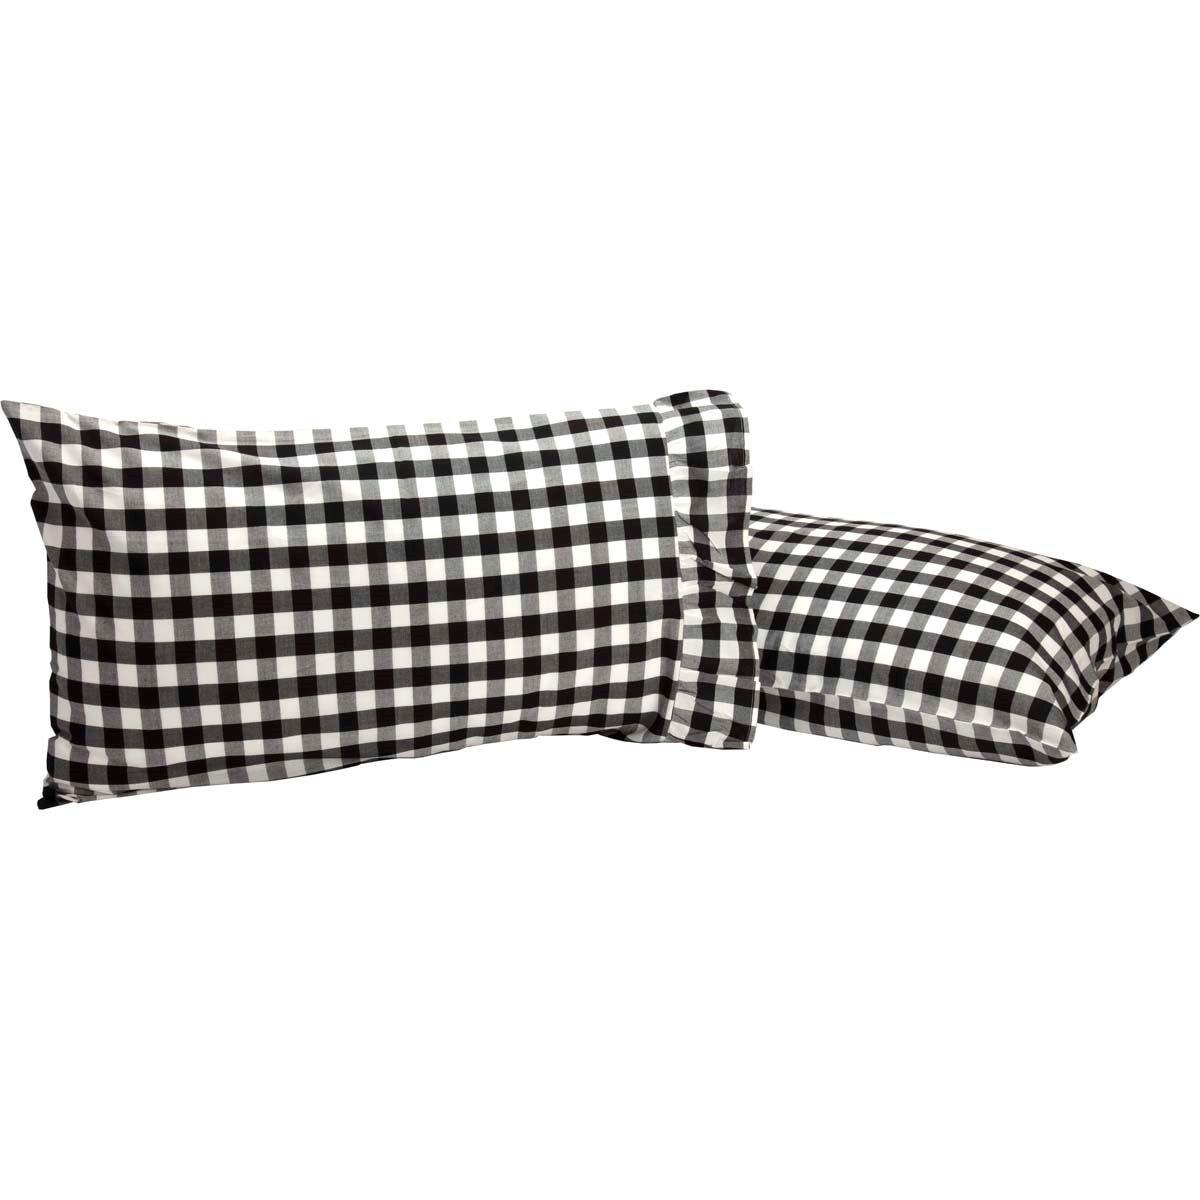 Annie Buffalo Black Check Standard Pillow Case Set of 2 21x30